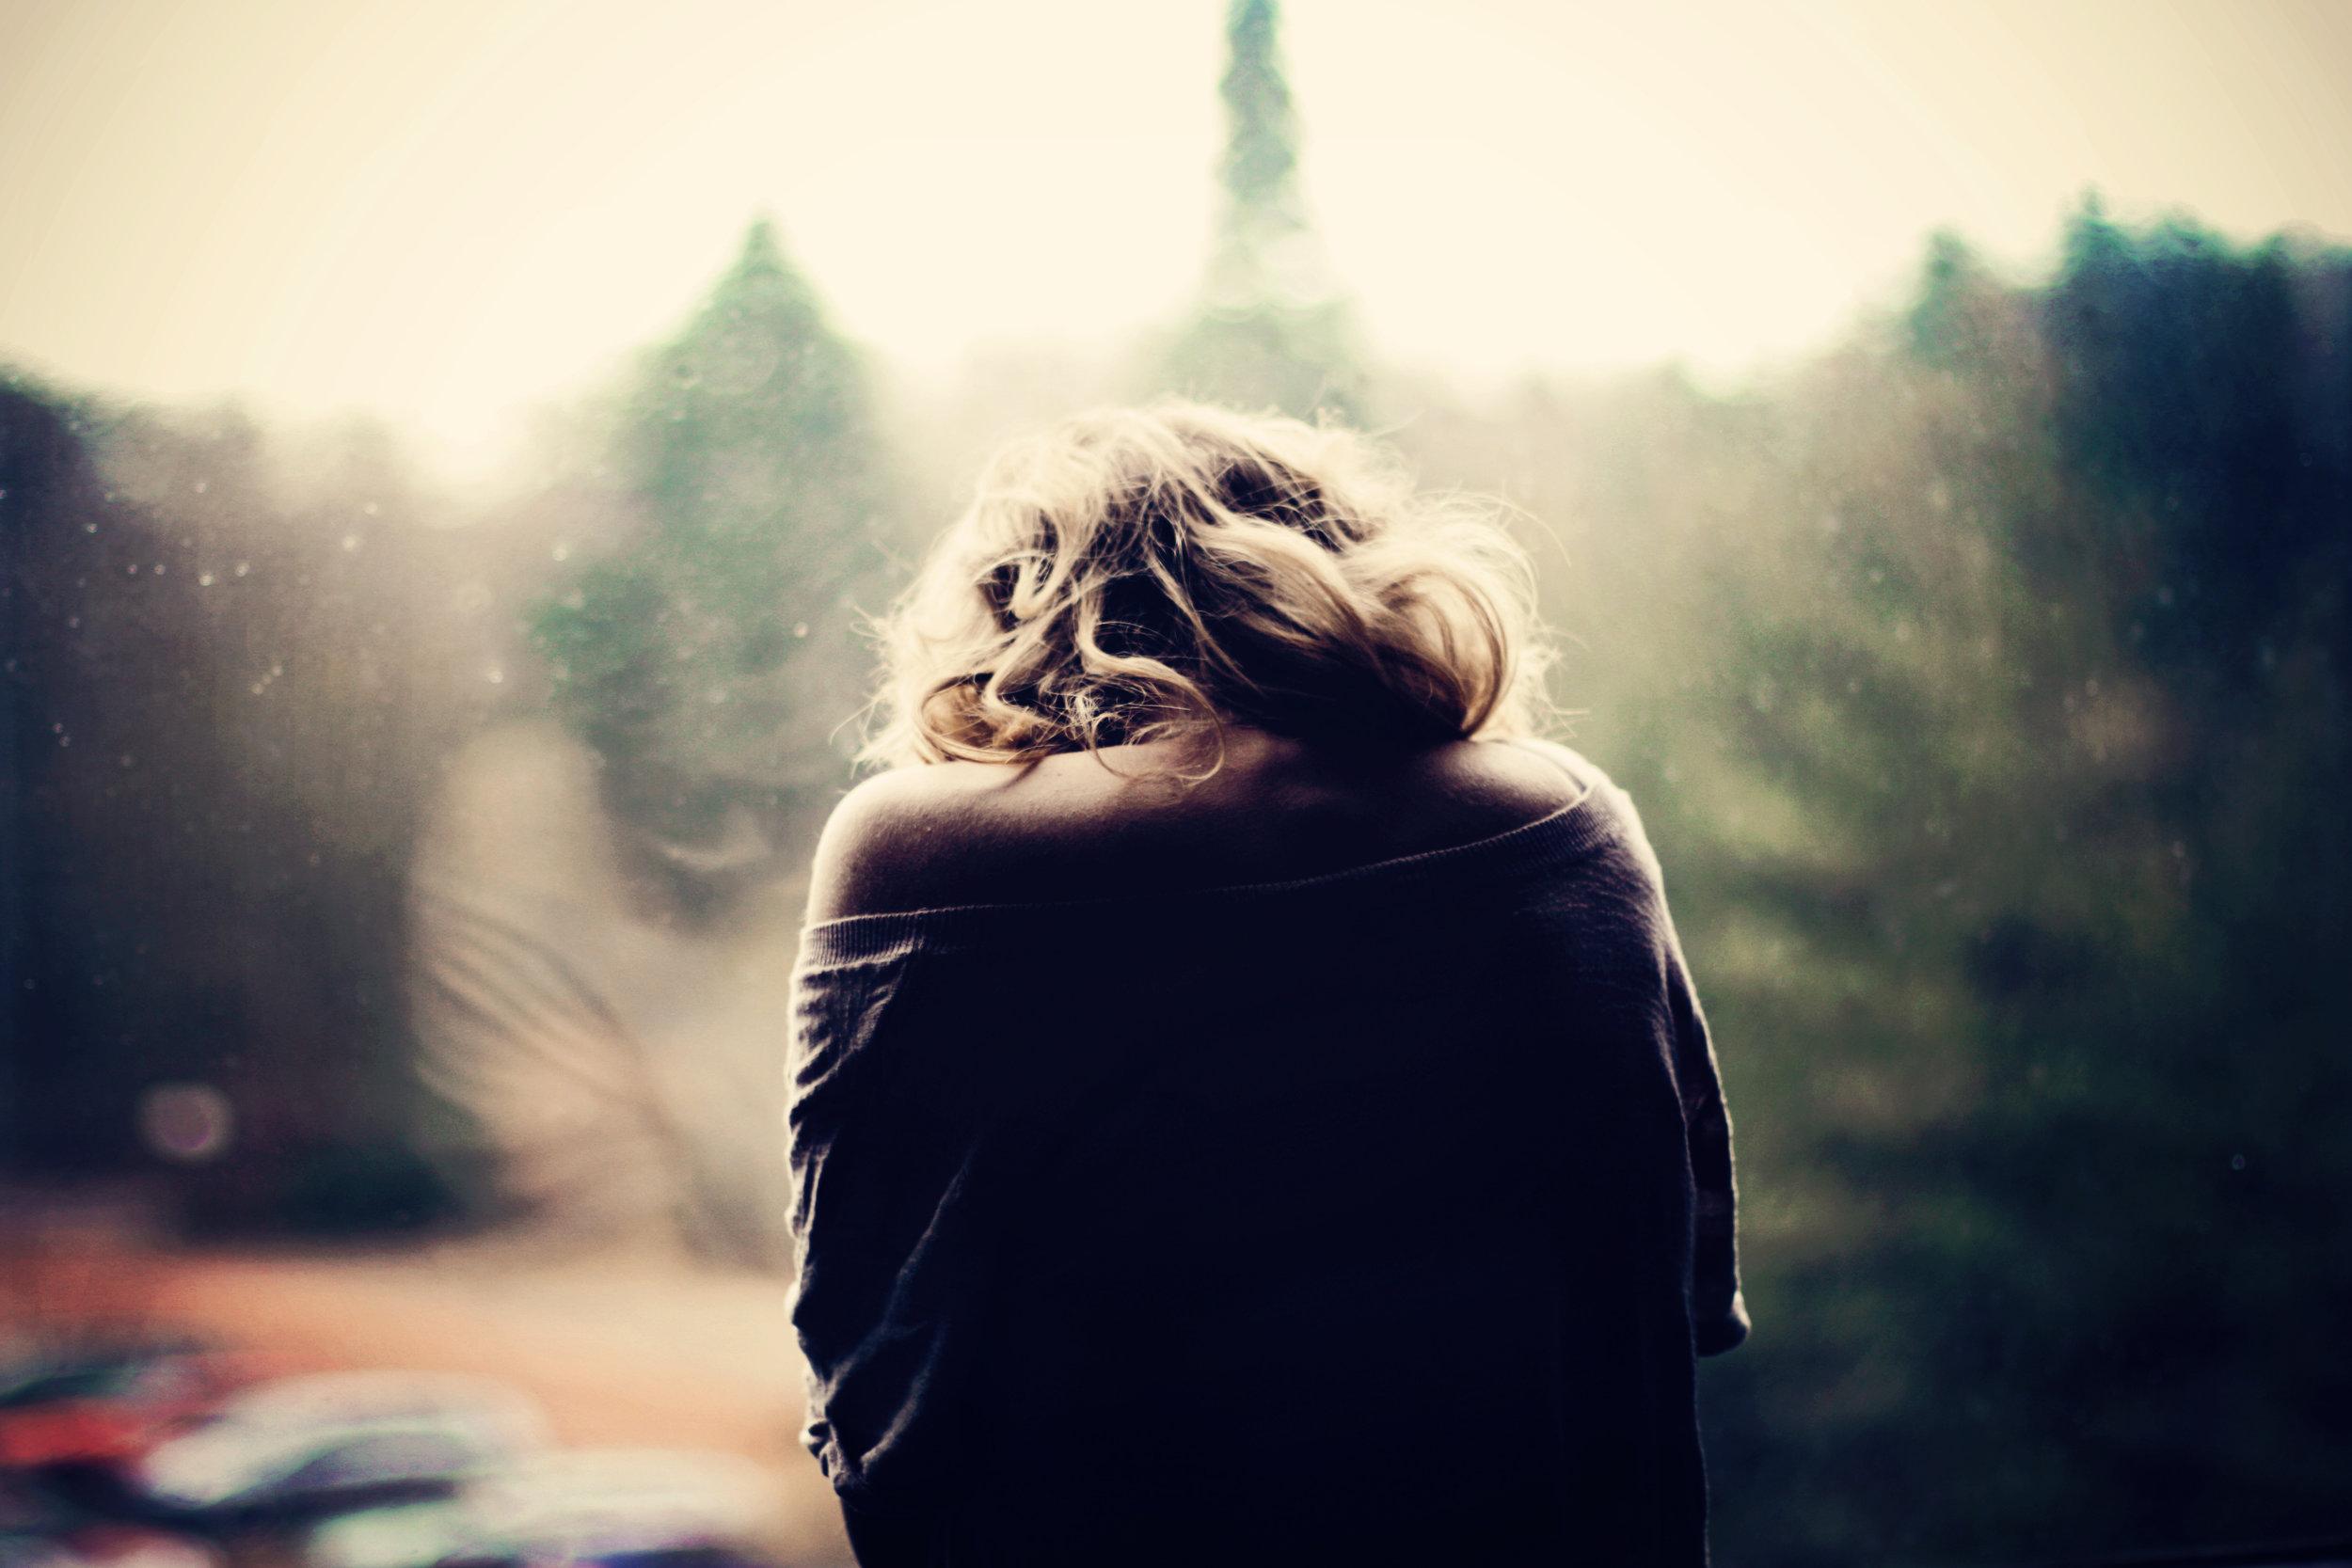 girl-sick-sadness-window-photo-car-mood-wallpaper1.jpg